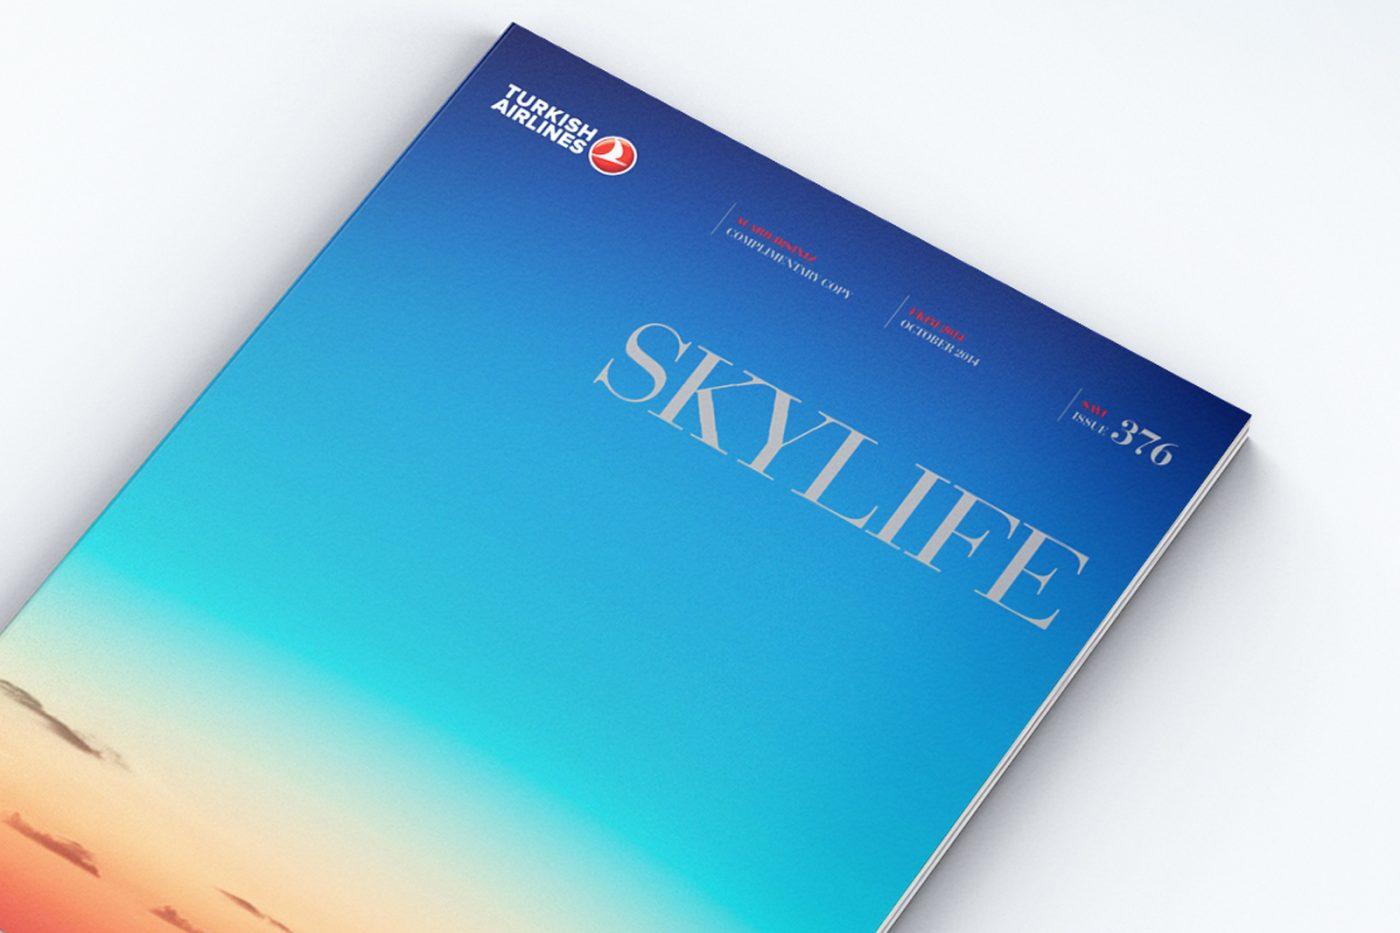 Turkish Airline | Skylife